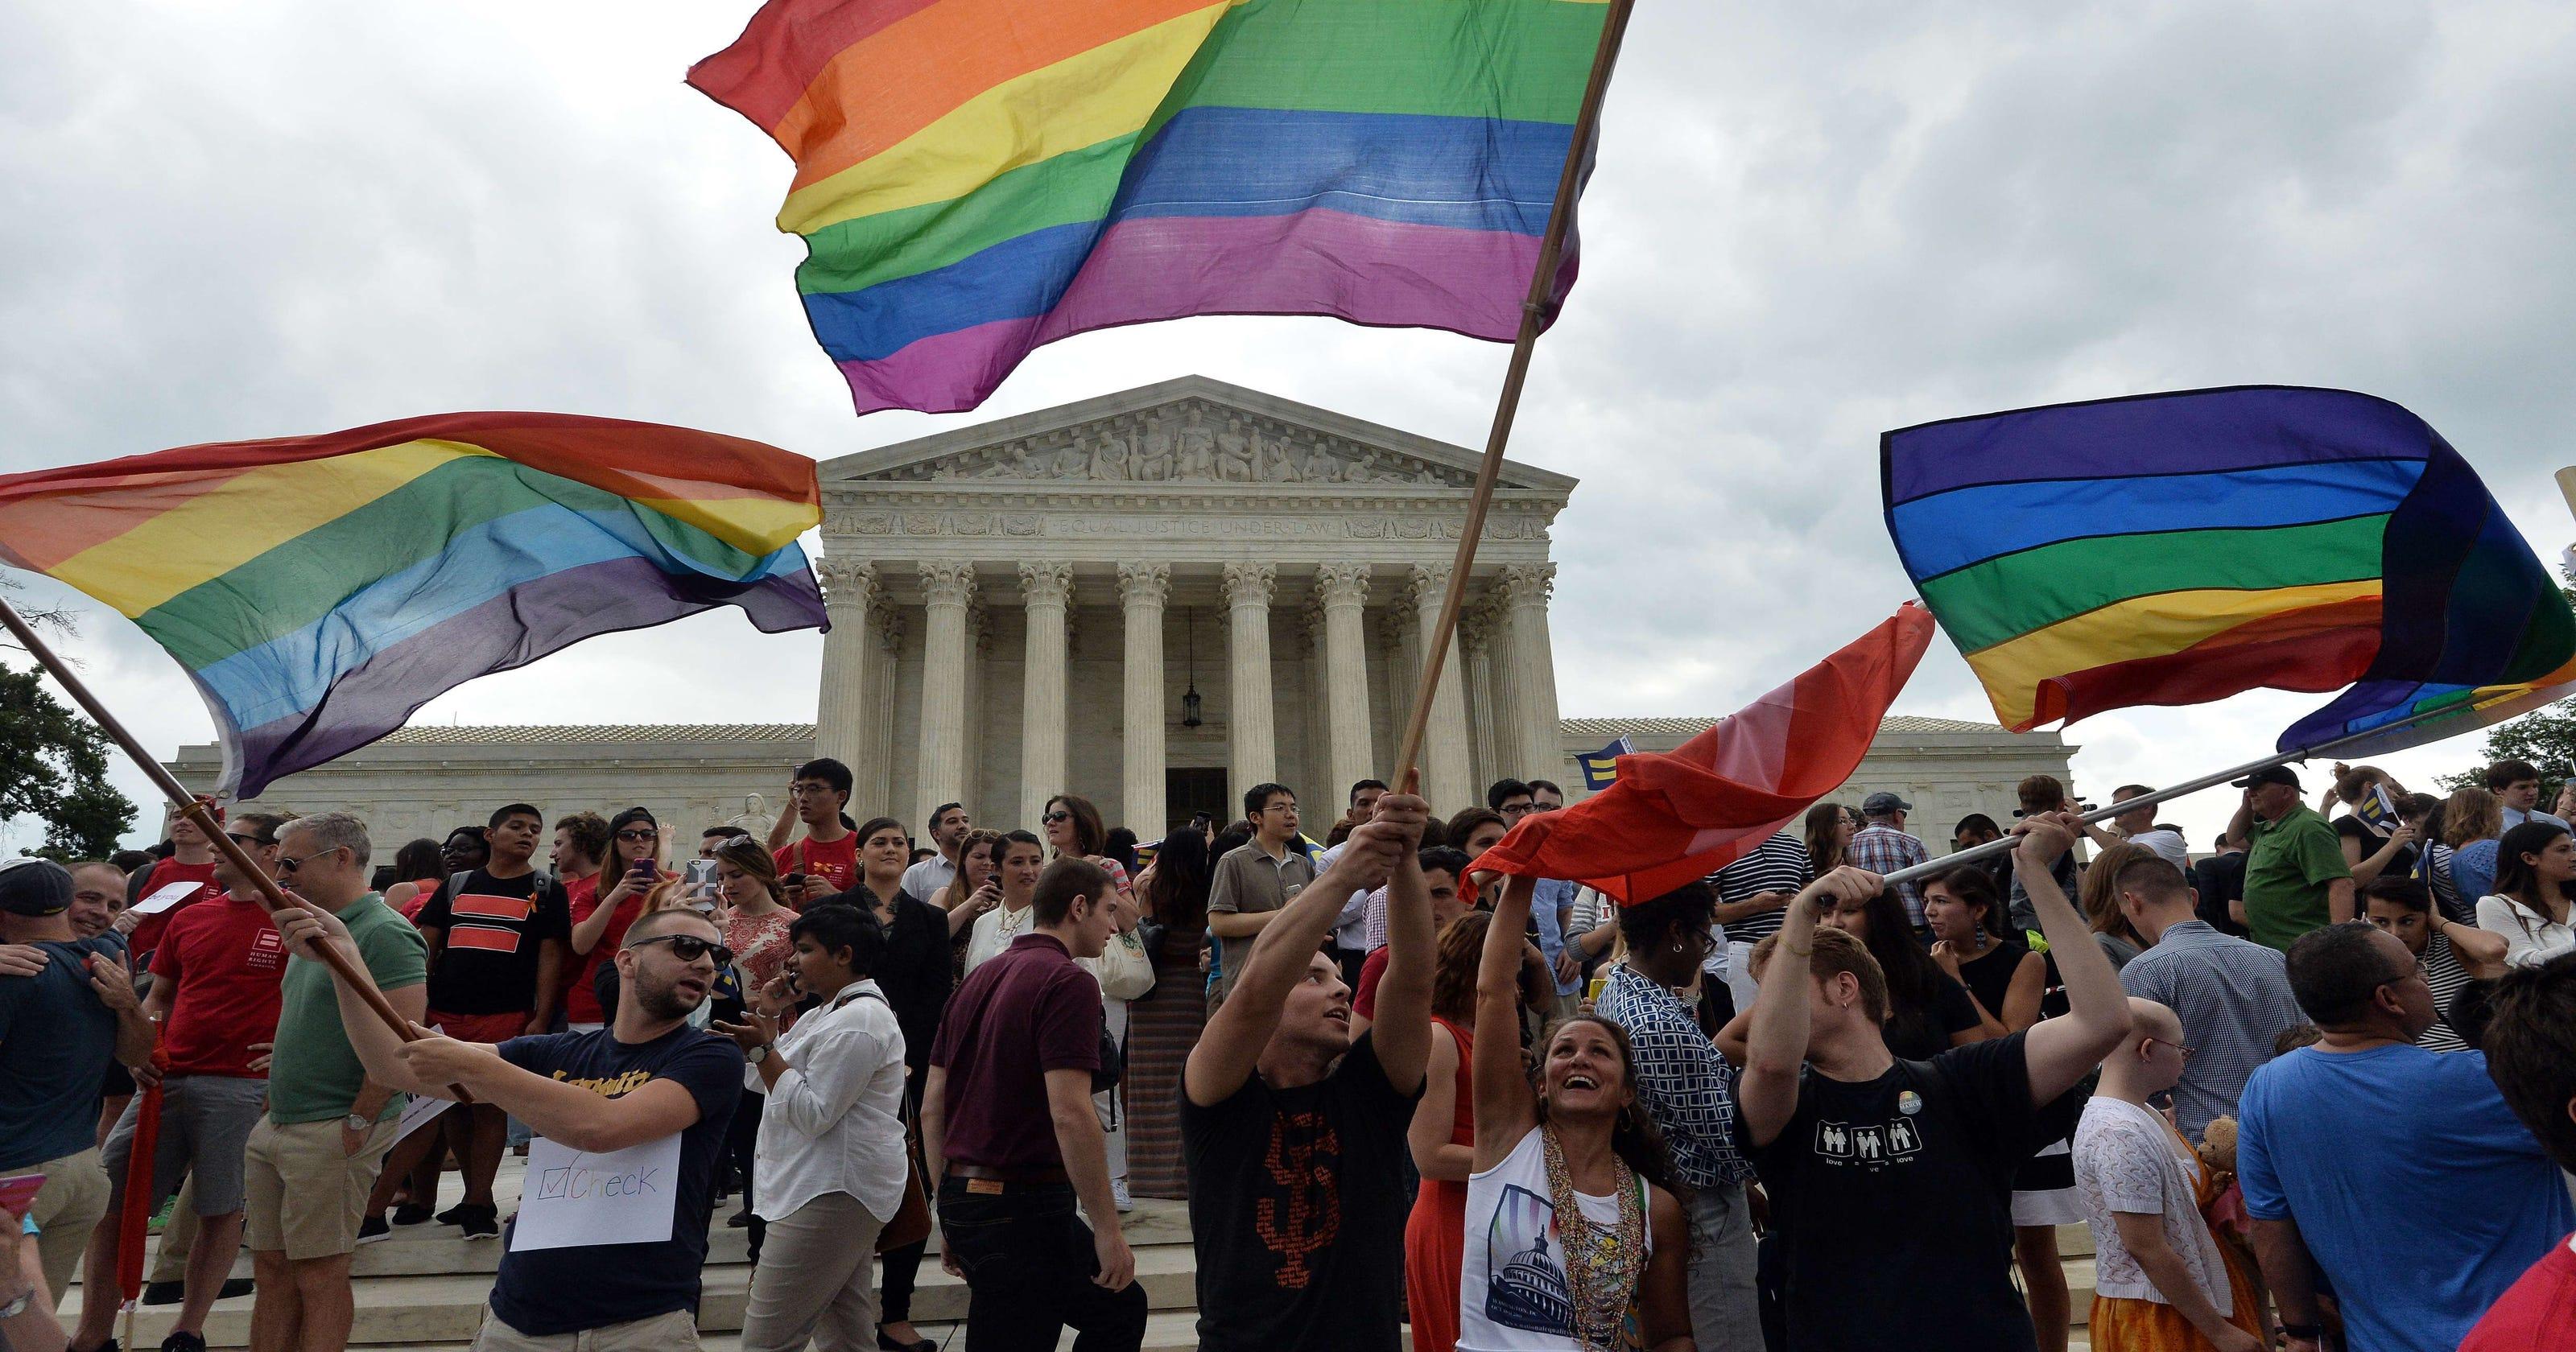 Regarding legalizing gay marriage